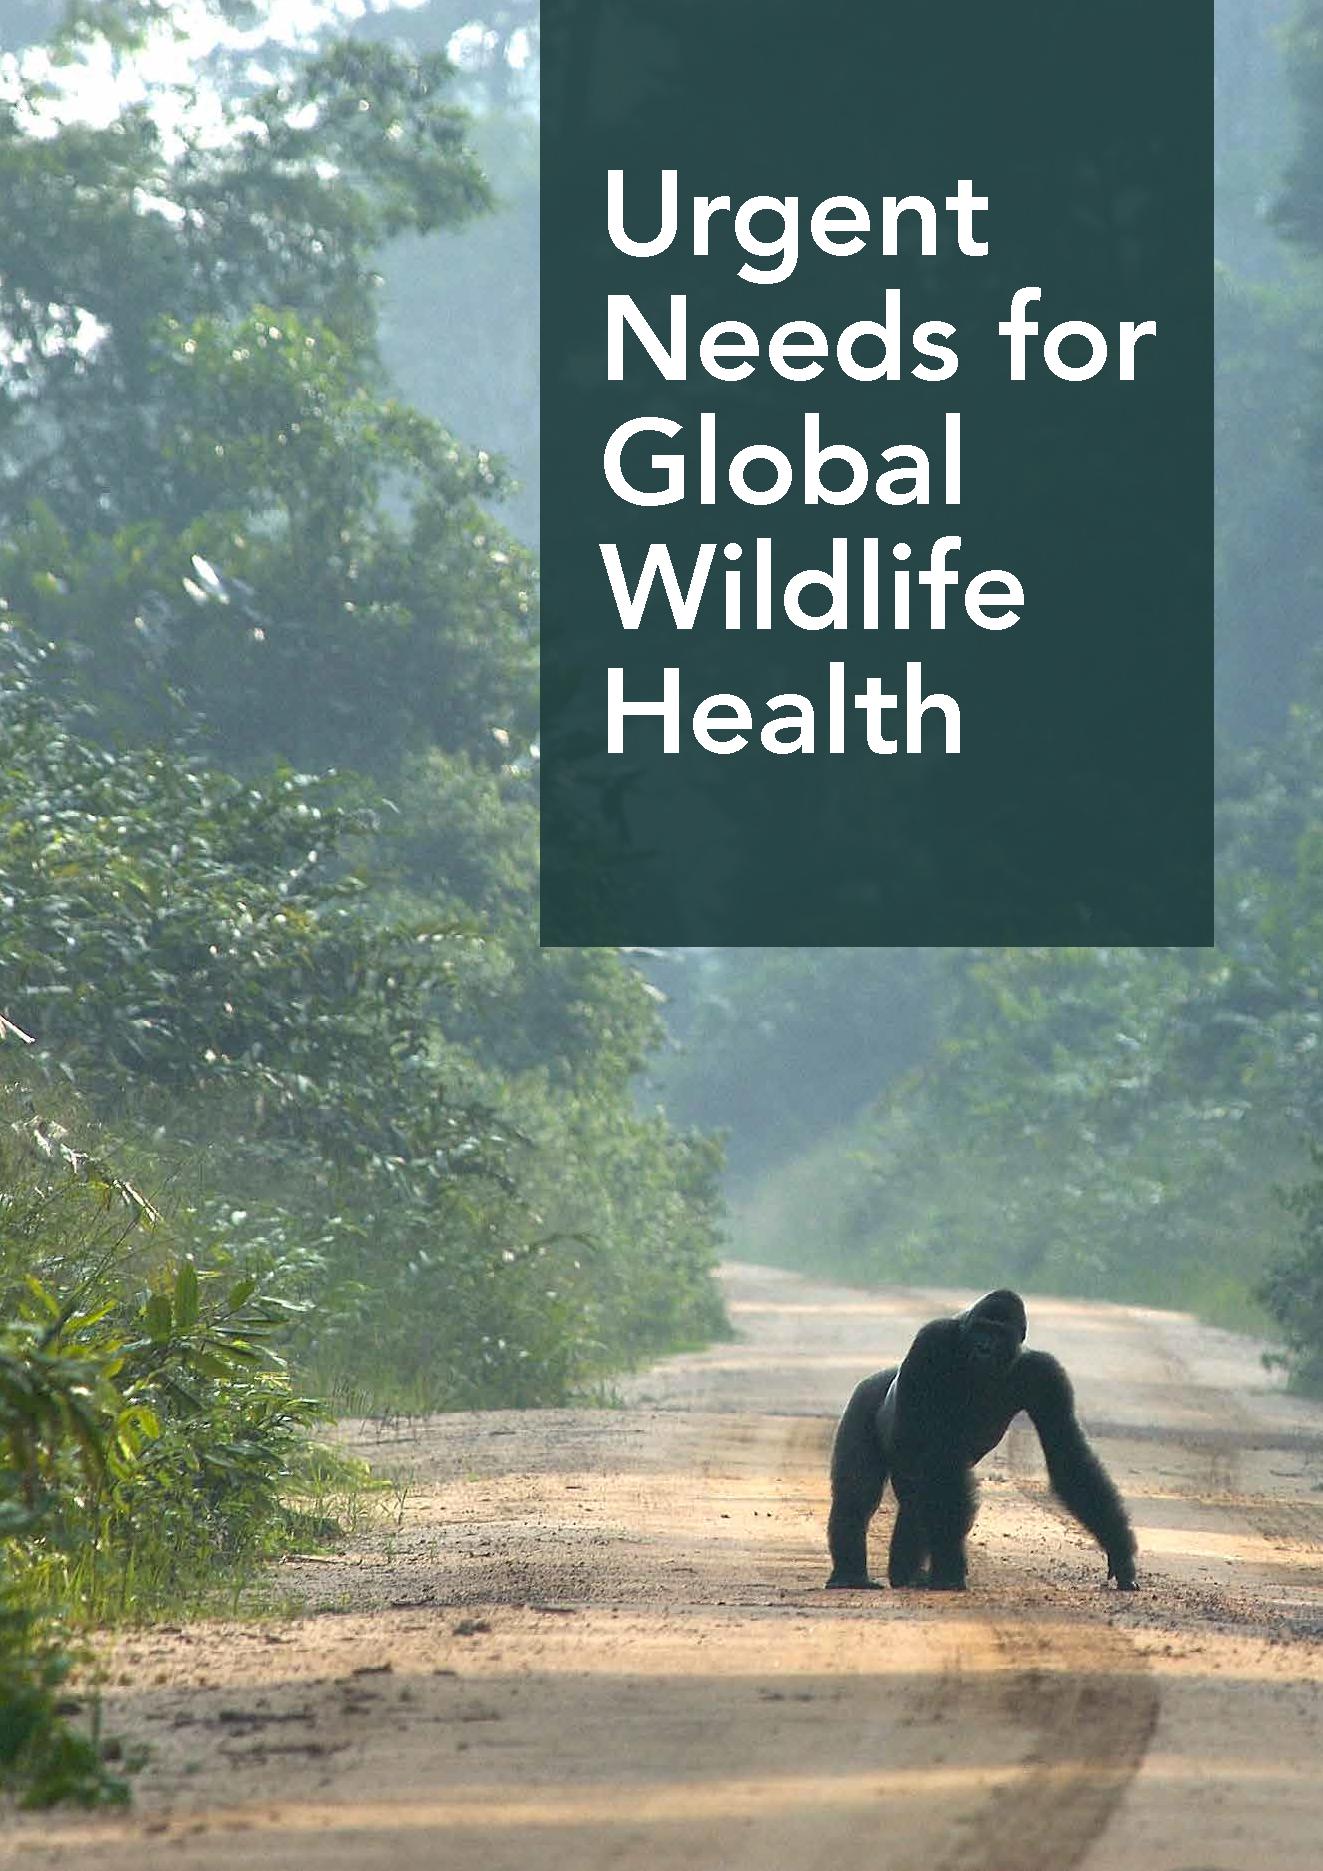 Urgent Needs for Global Wildlife Health